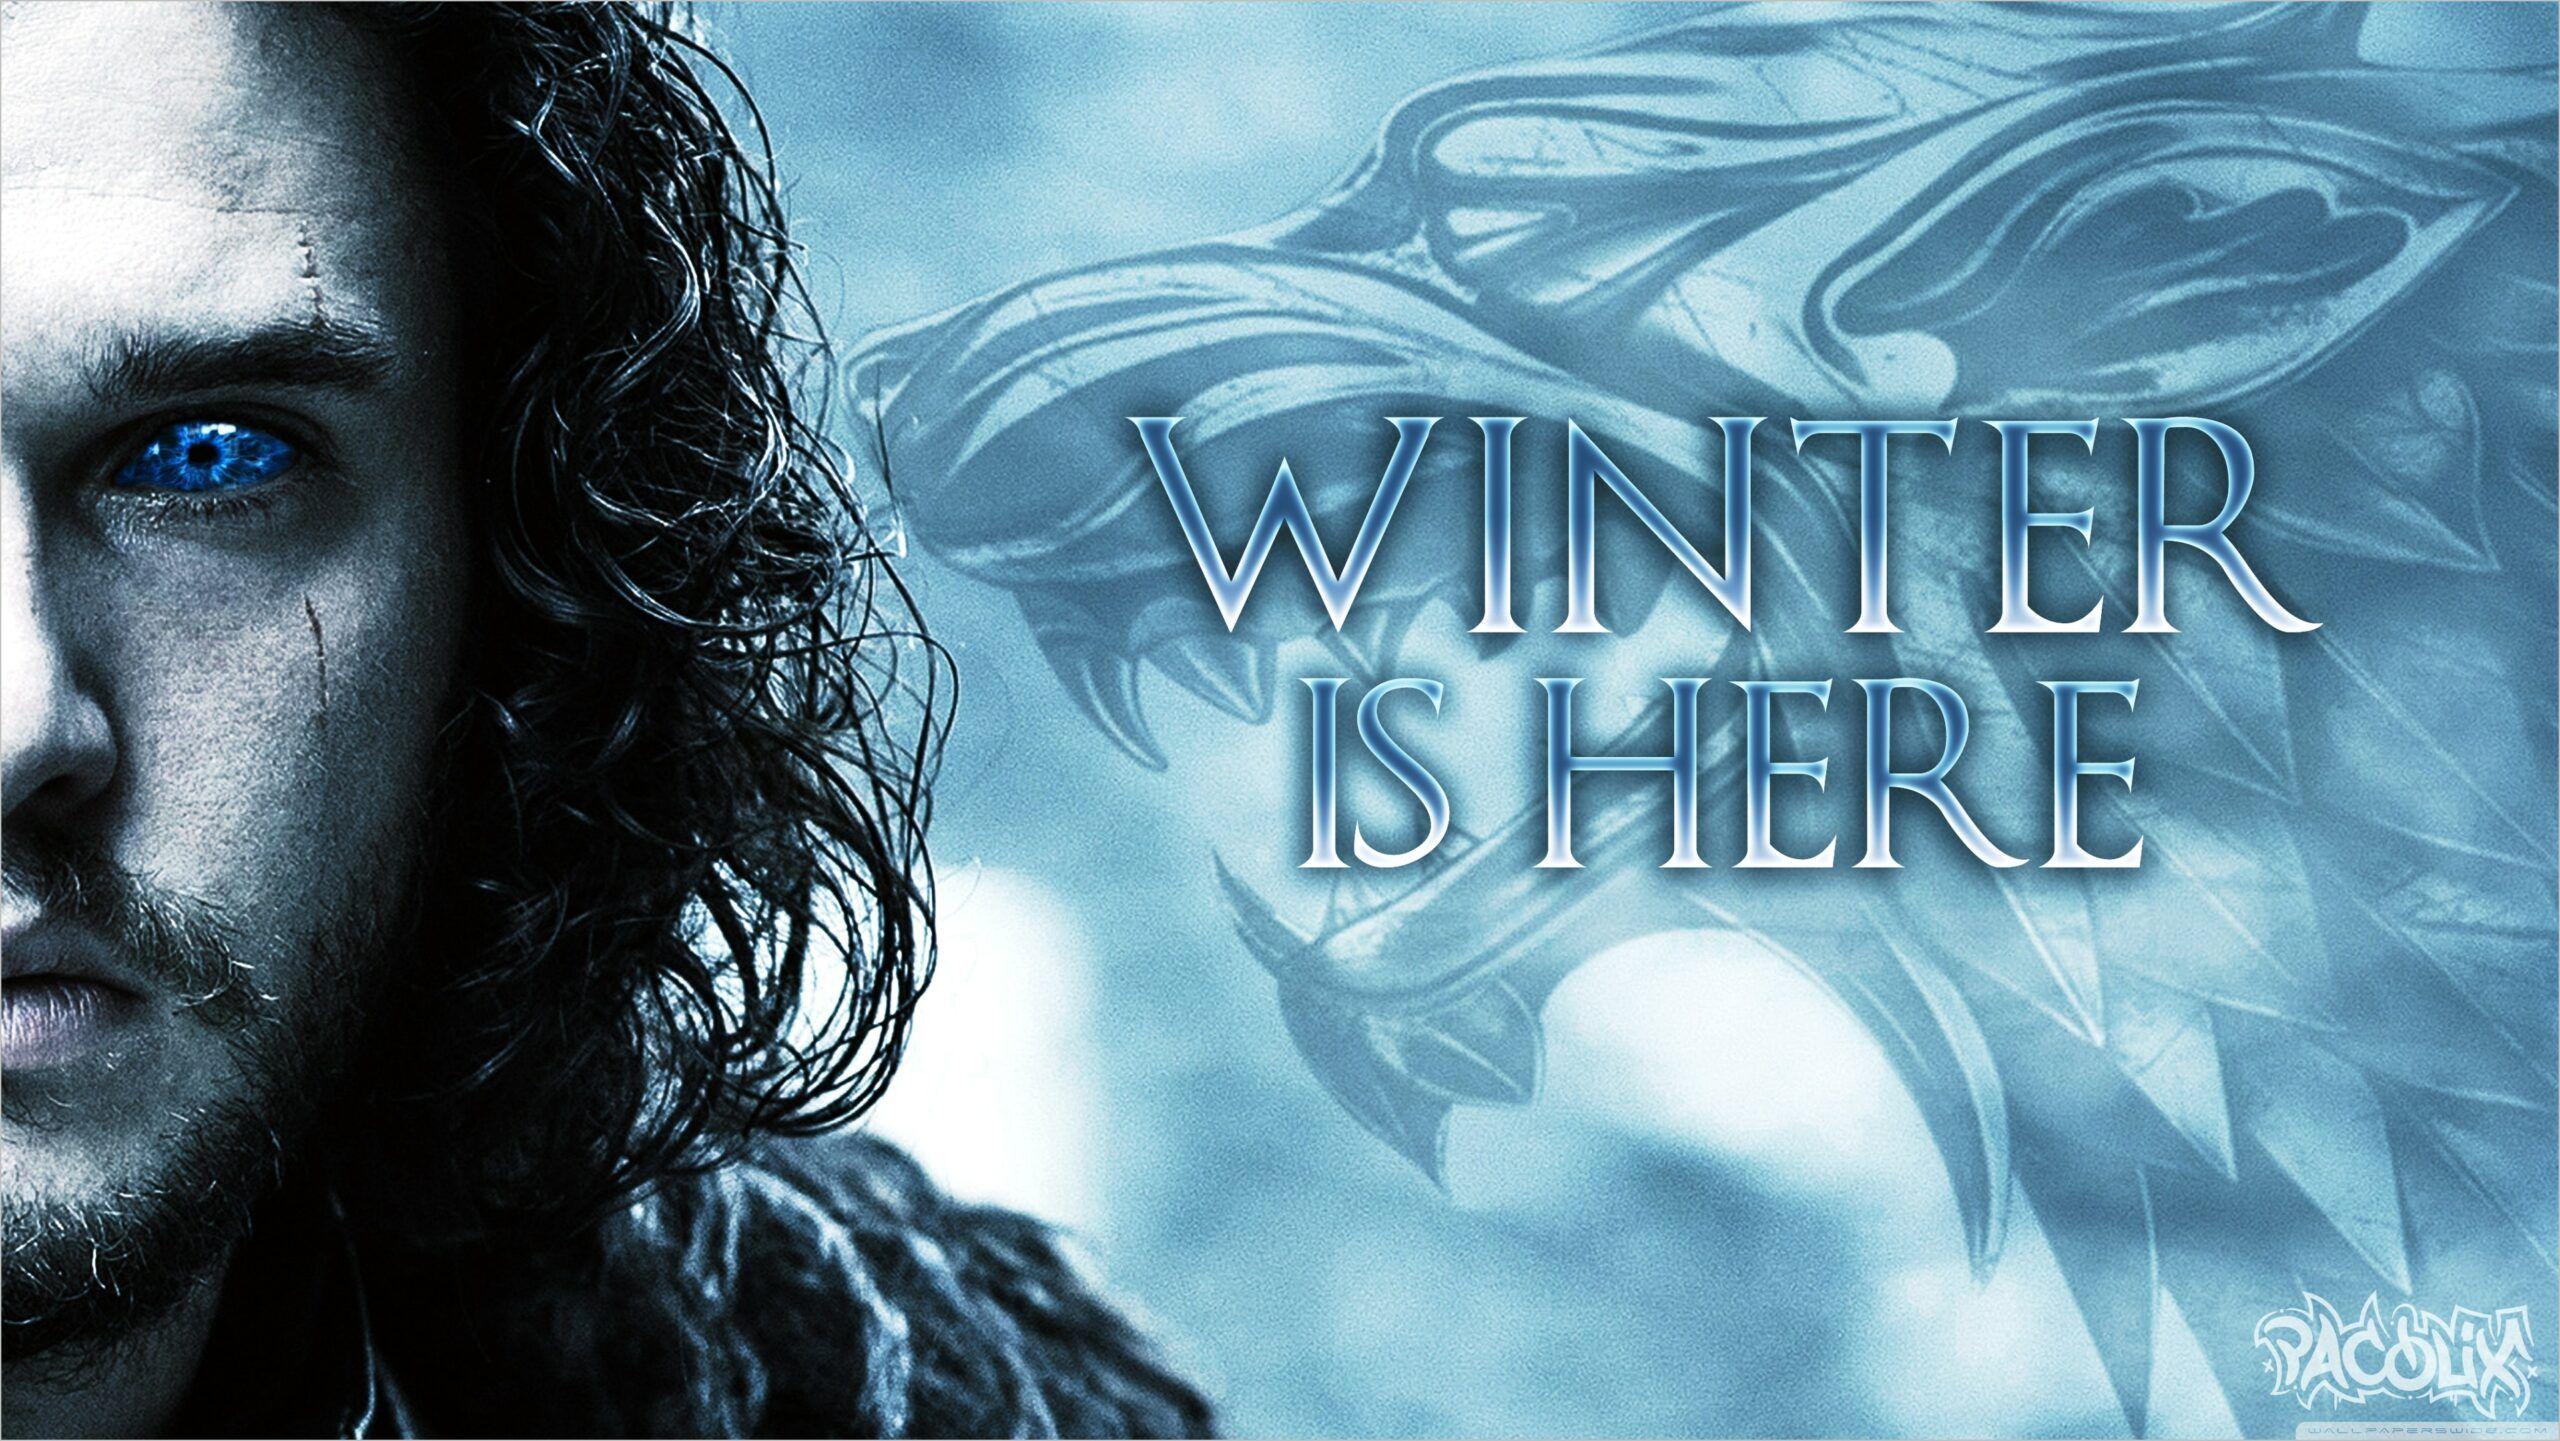 Game Of Thrones 4k Wallpaper In 2020 Winter Is Here Winter Is Coming Wallpaper Game Of Thrones Winter